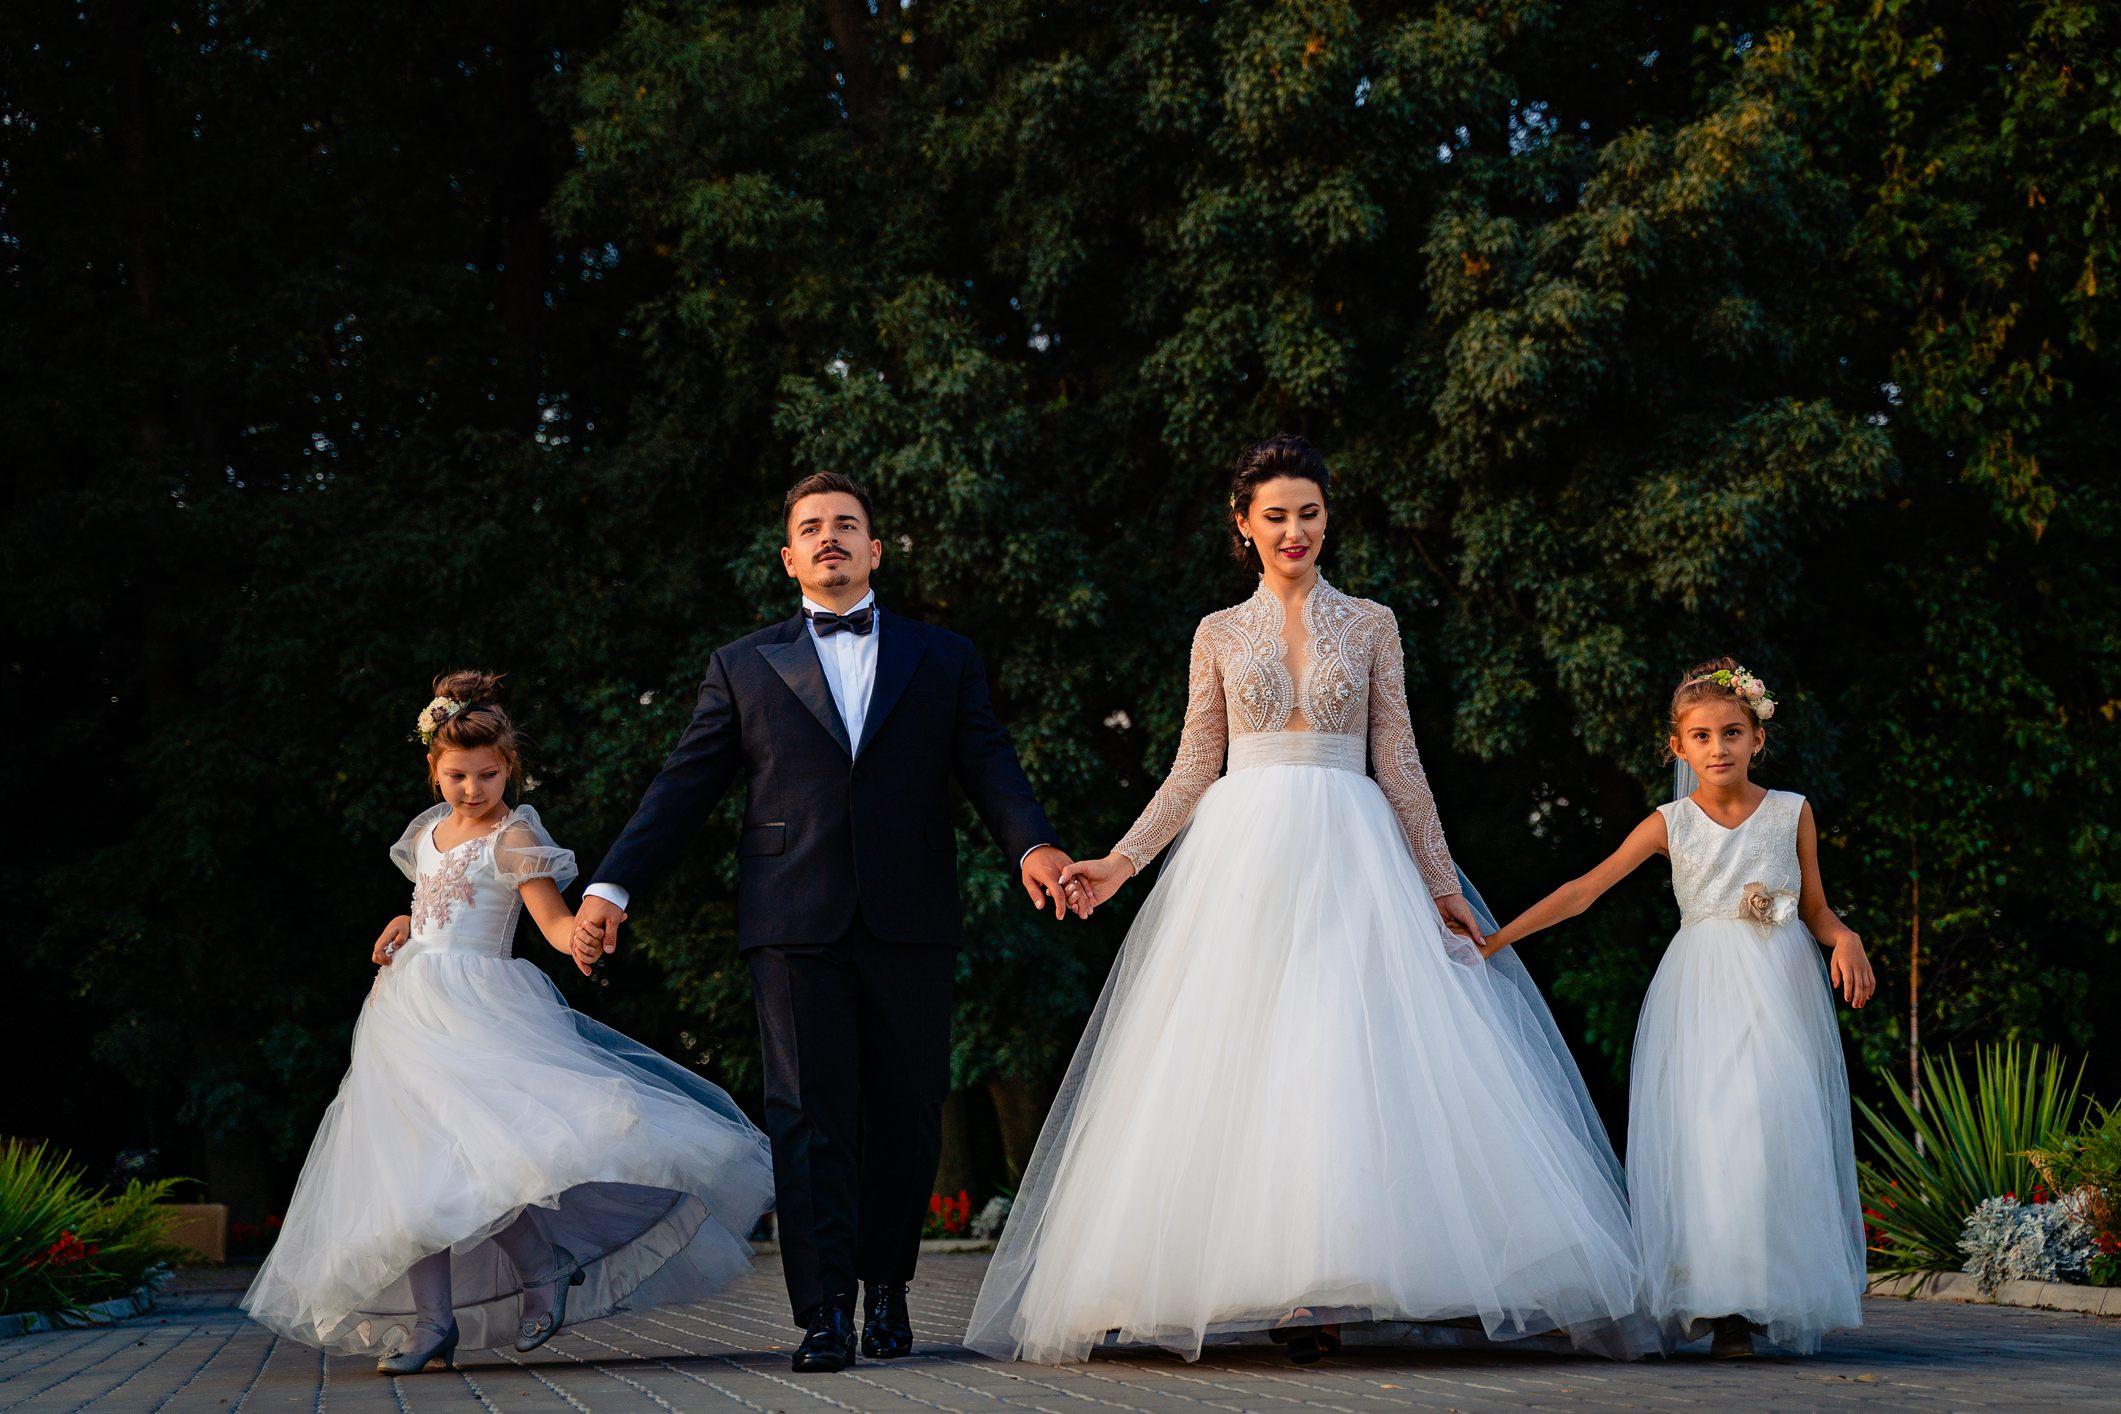 fotograf nunta bucuresti laurentiu nica  20 - Lorena & Matei | Fotografii nunta Bucuresti | Restaurant Domeniul cu Ciresi